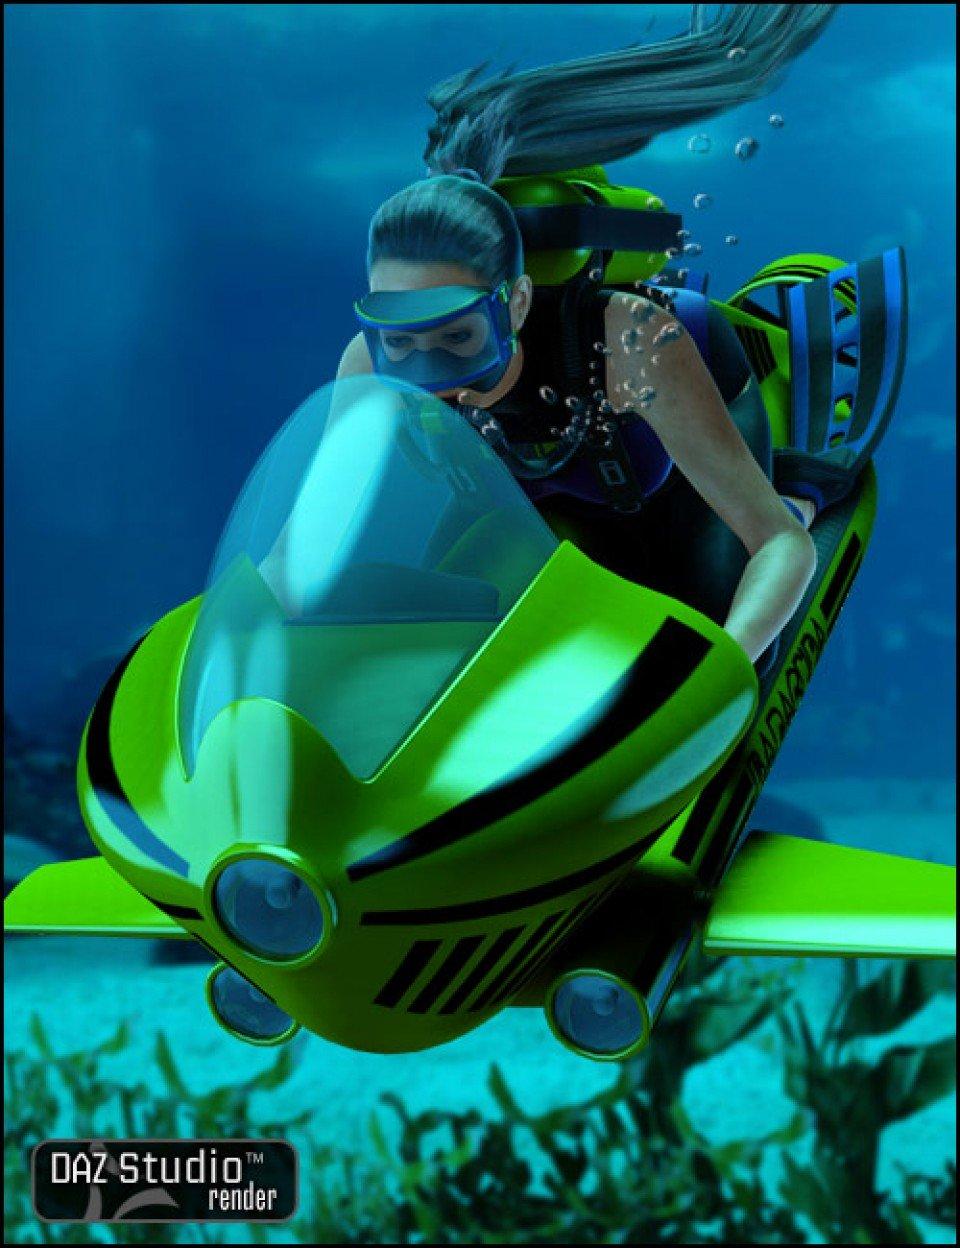 Underwater Scooter_DAZ3D下载站